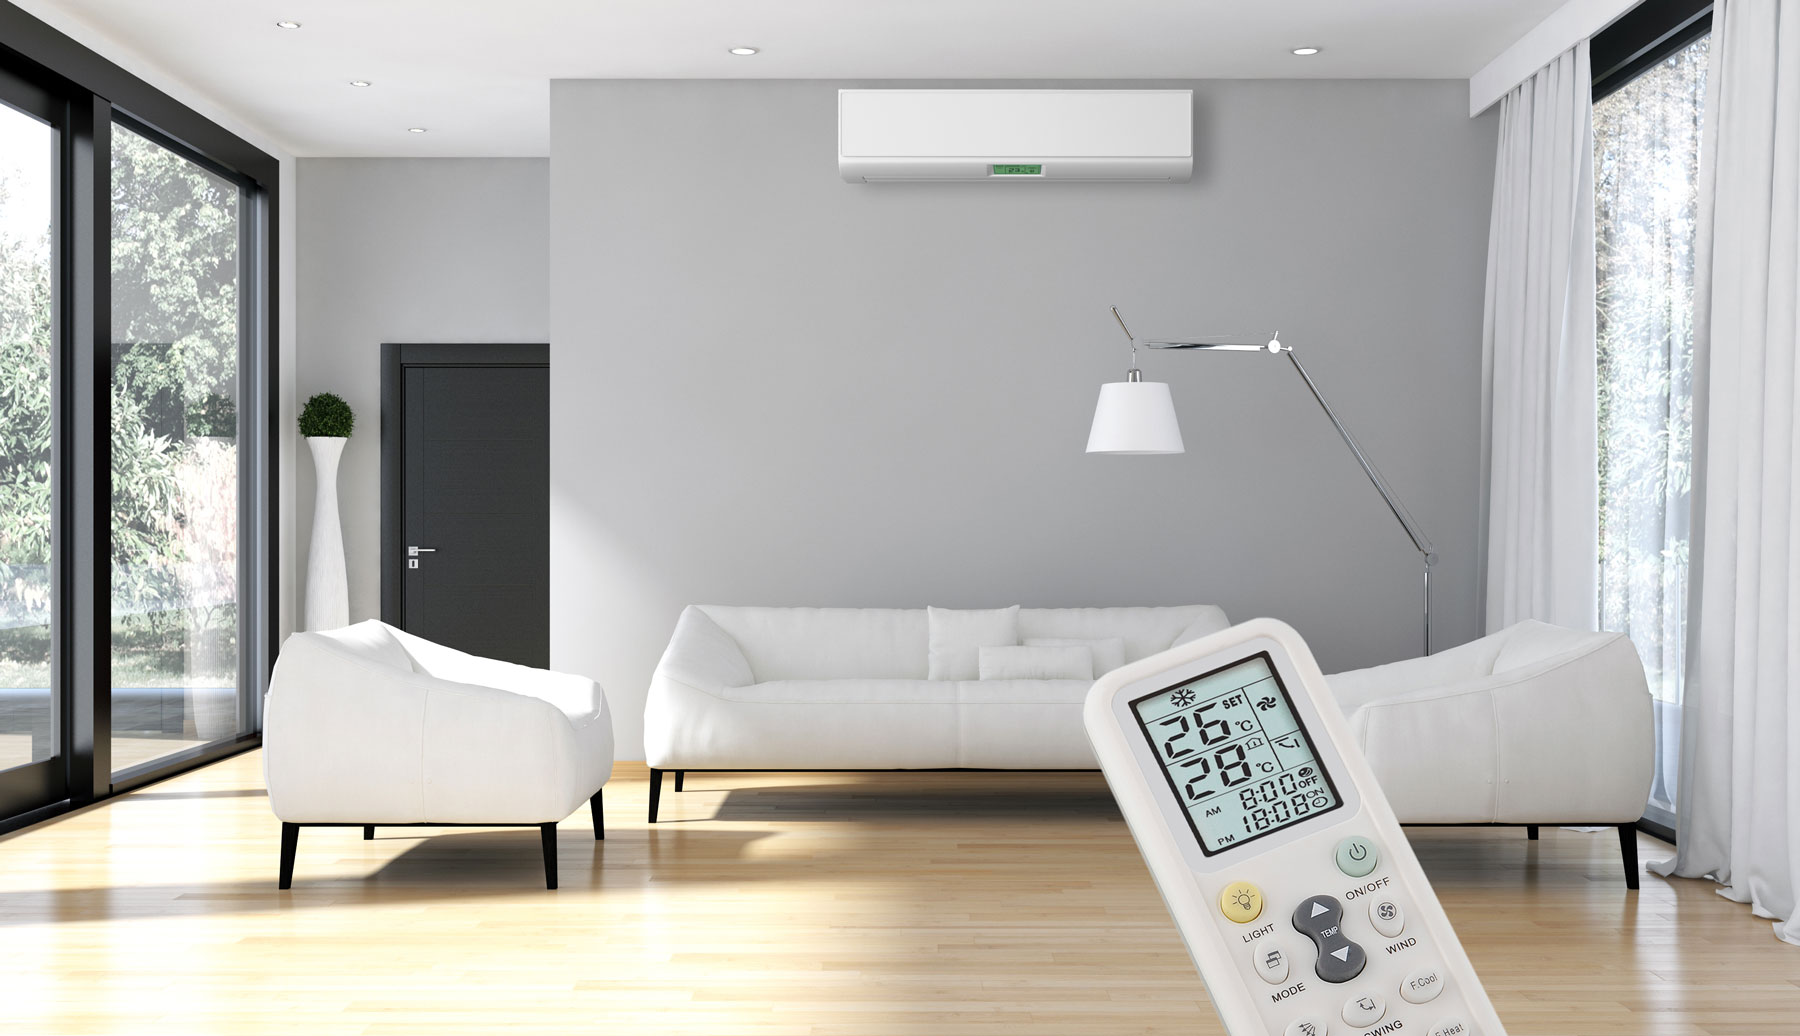 klimaanlagen-seibert